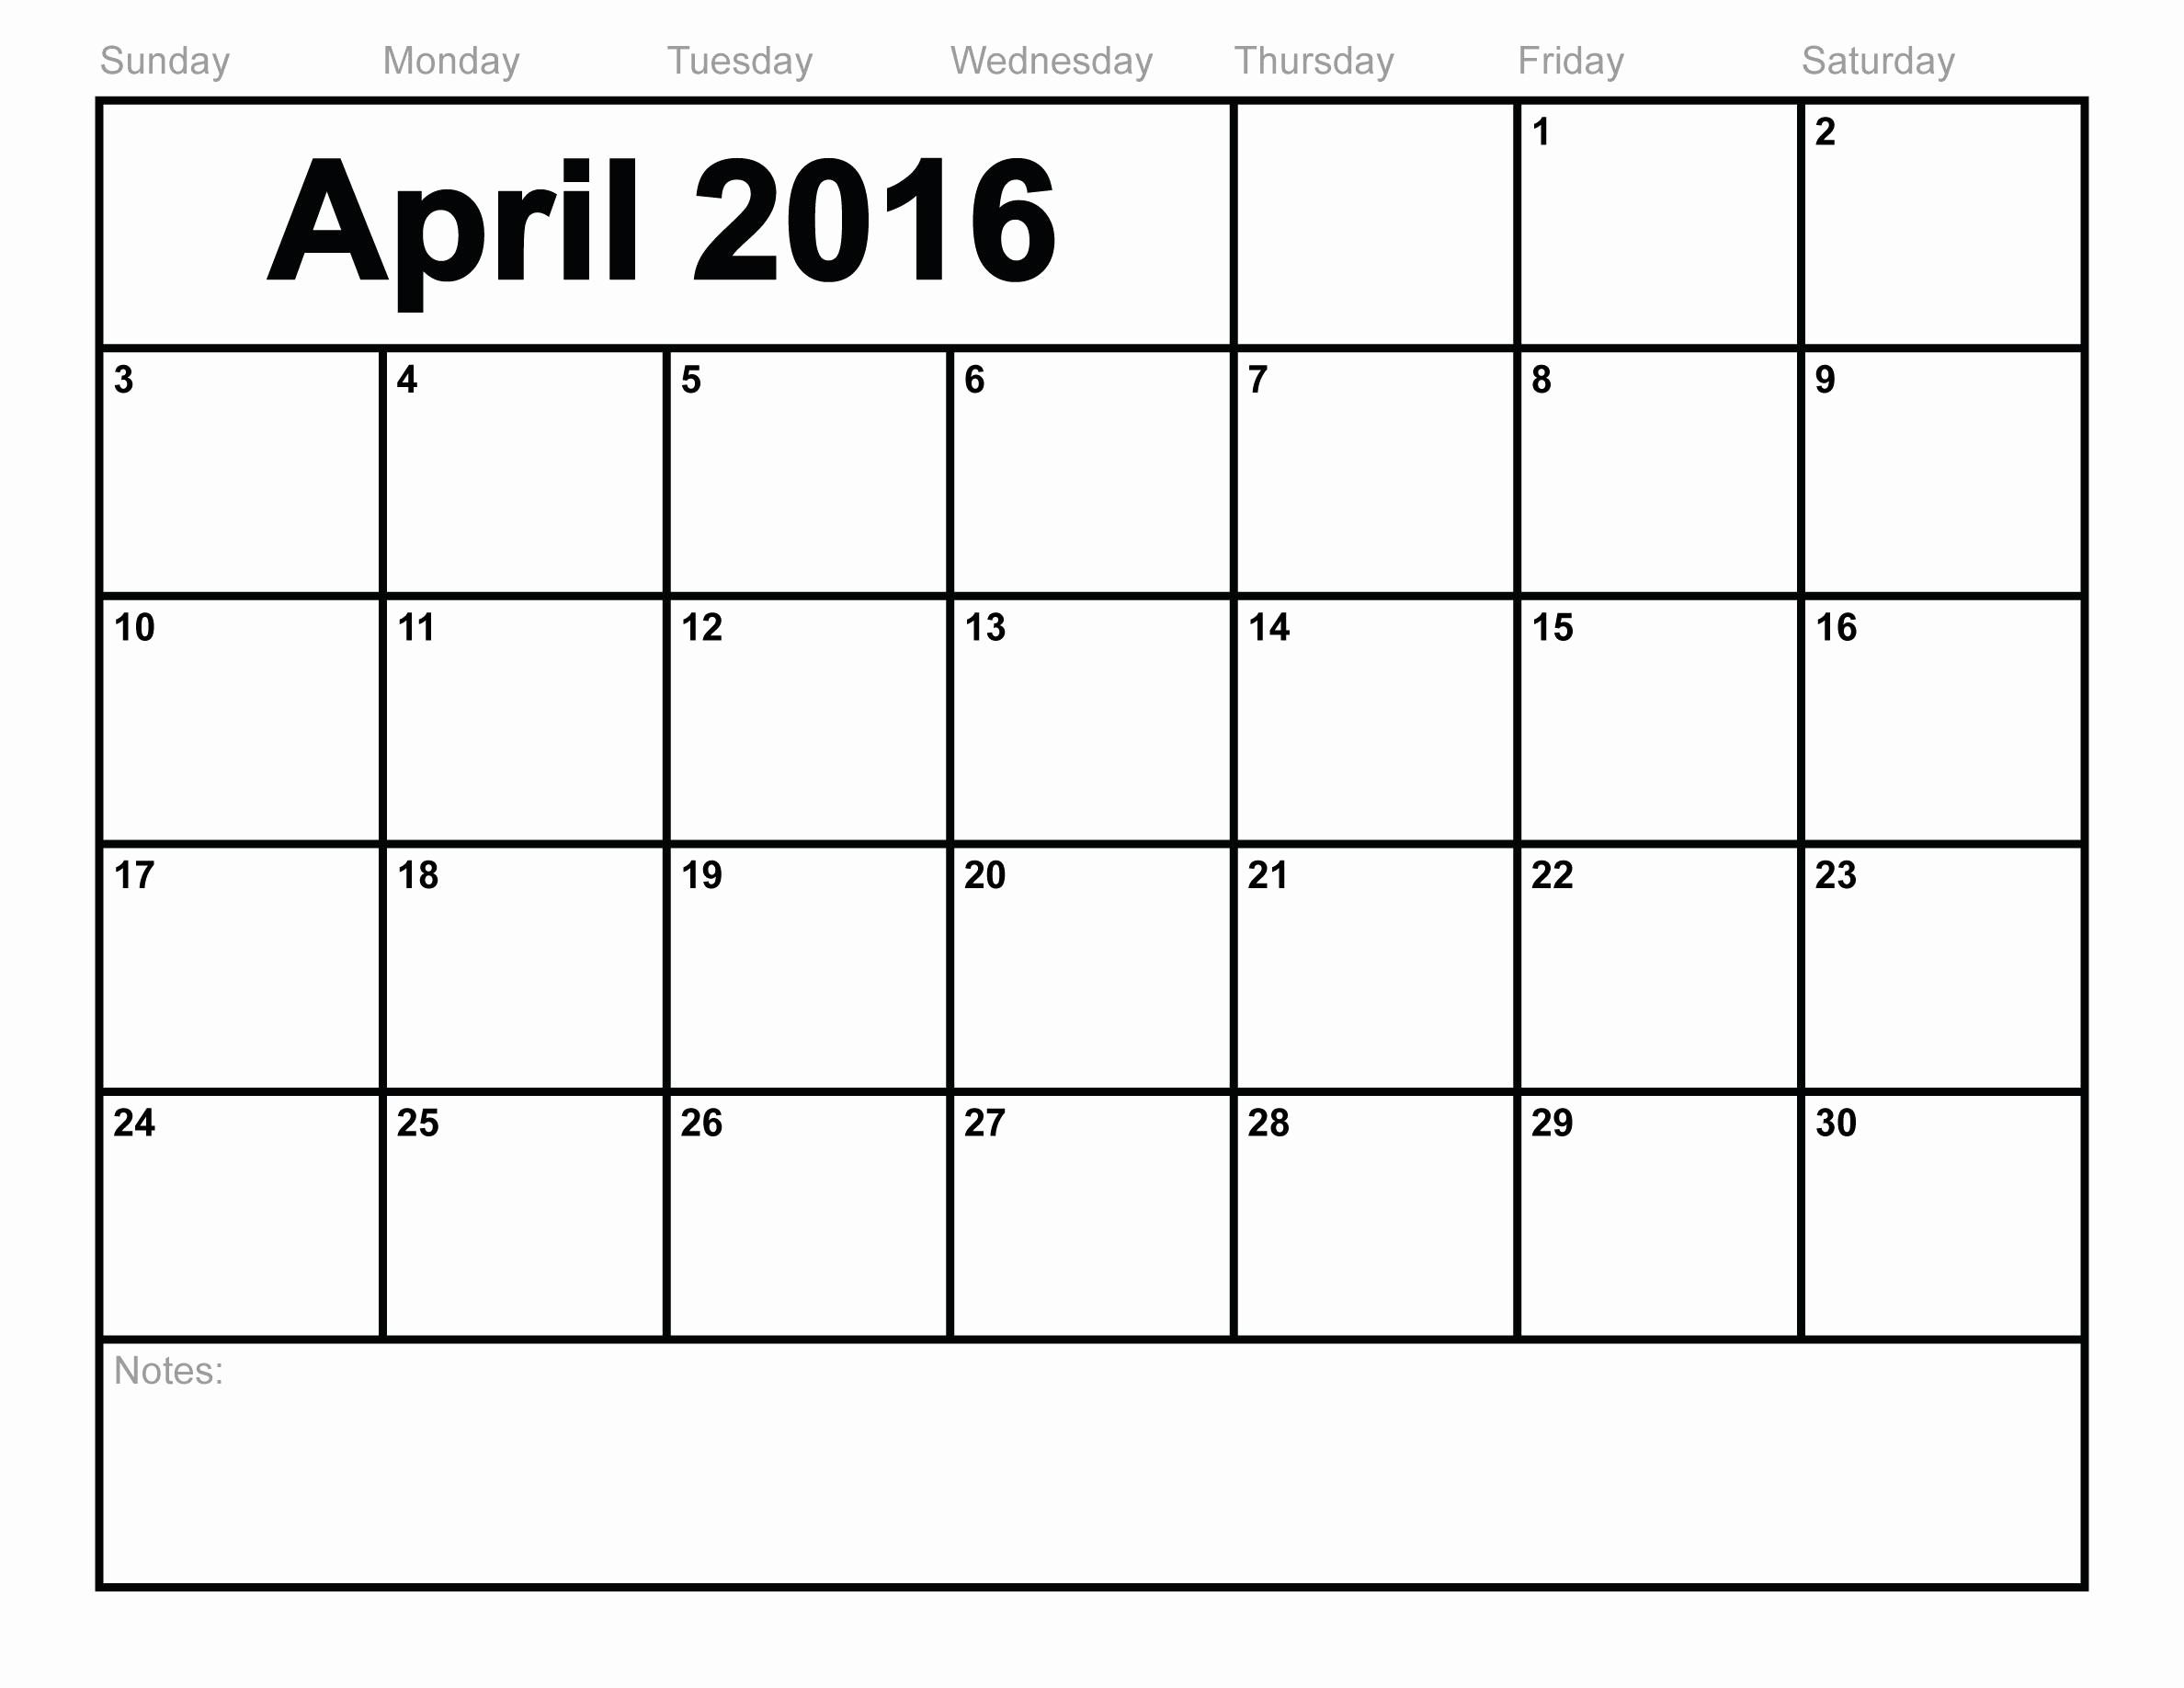 Free Printable Calendar 2016 Templates Elegant Free Printable March Calendars 2016